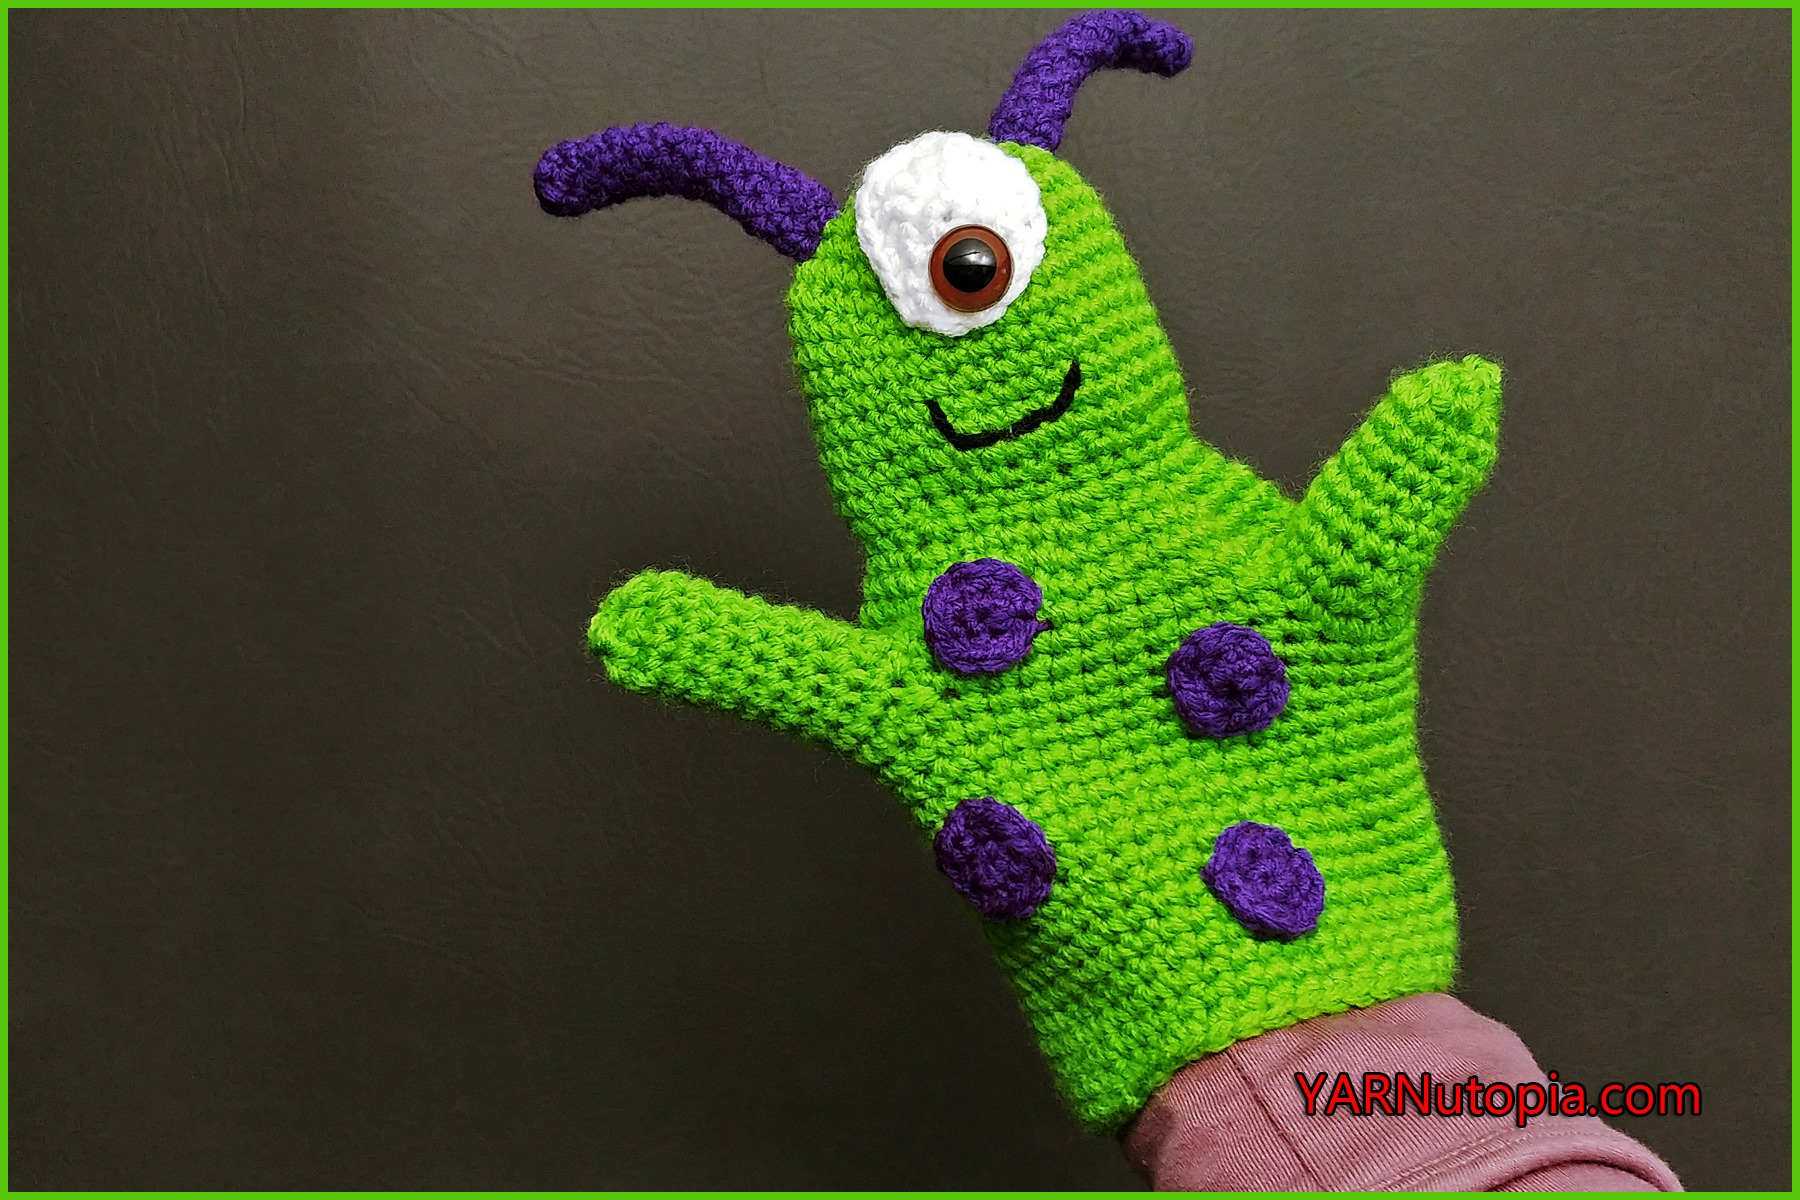 How to Add Eyelashes on Amigurumi Crochet Dolls [Video Tutorial ... | 1200x1800